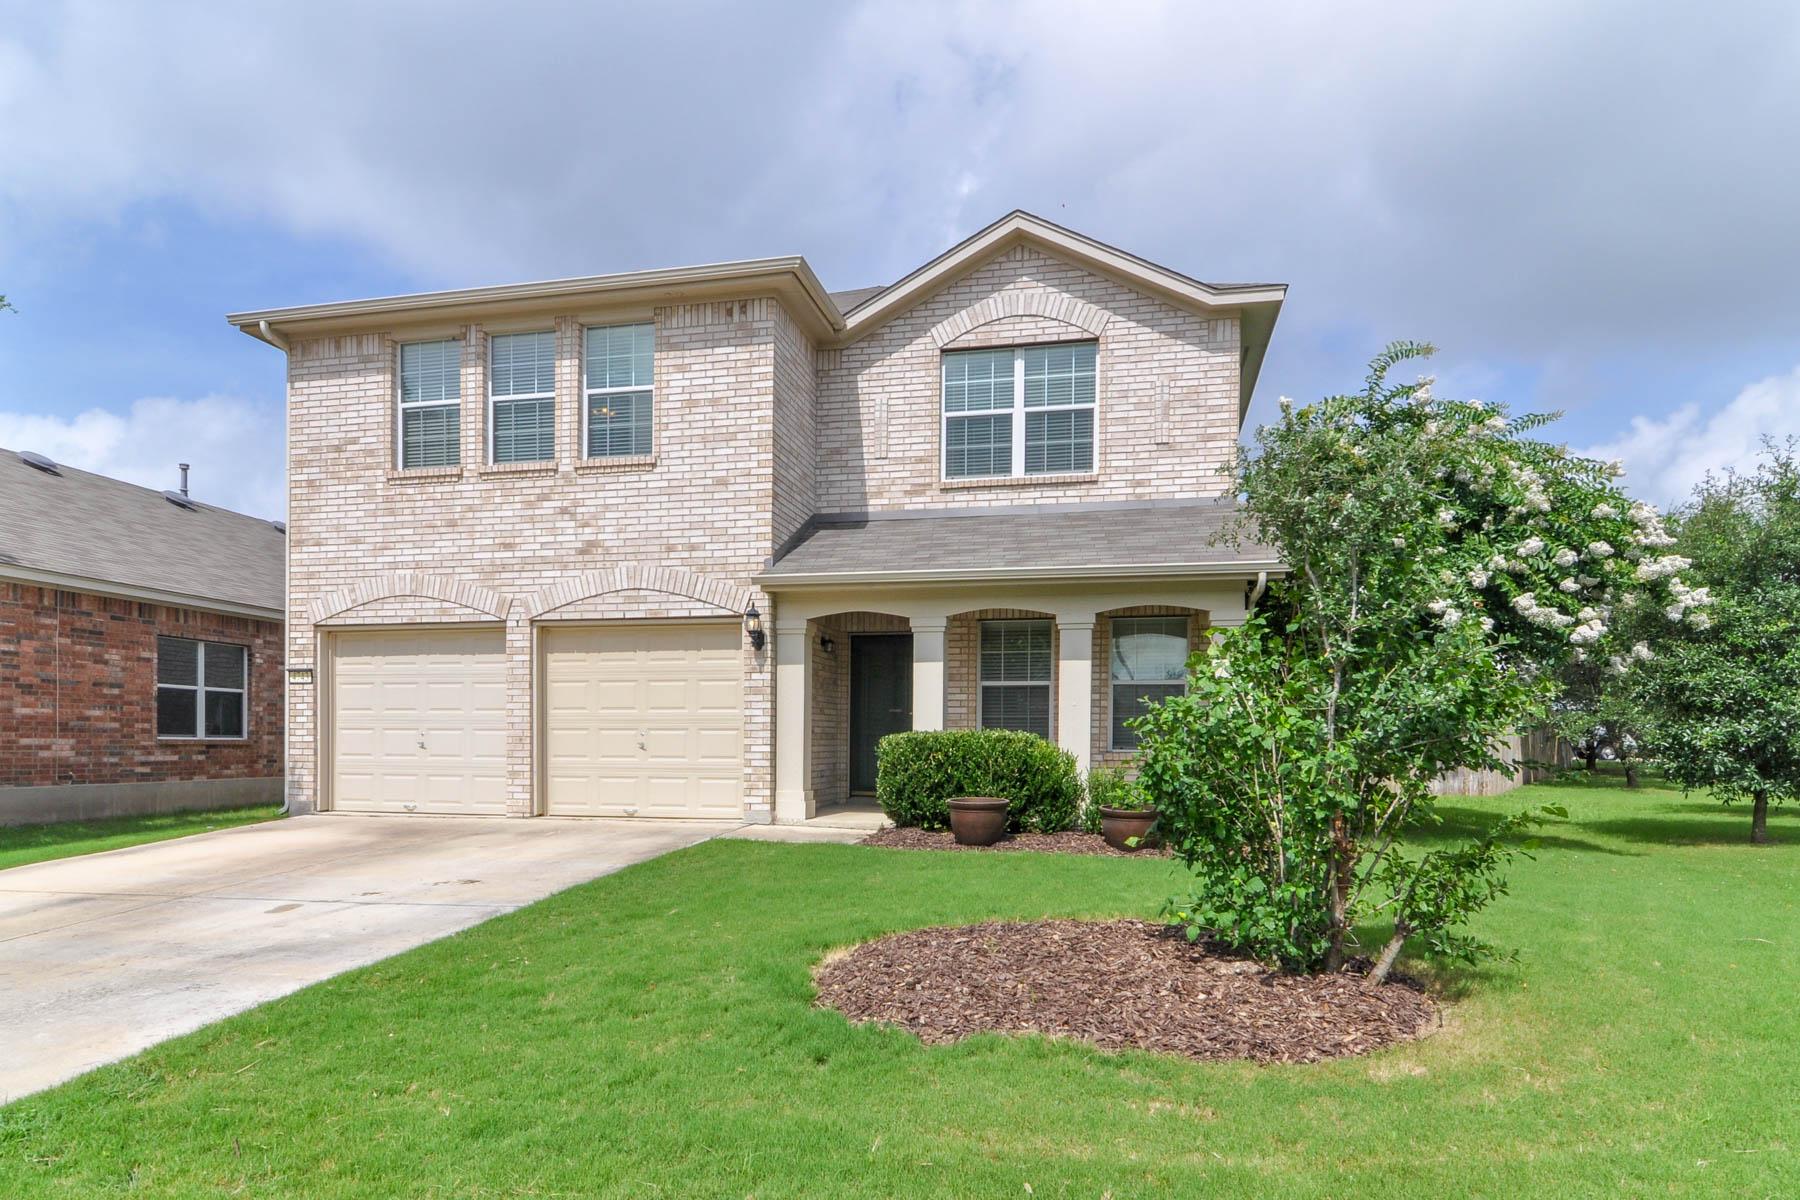 Single Family Home for Sale at Beautiful Home in Alamo Ranch 4743 Thomas Rusk Alamo Ranch, San Antonio, Texas 78253 United States